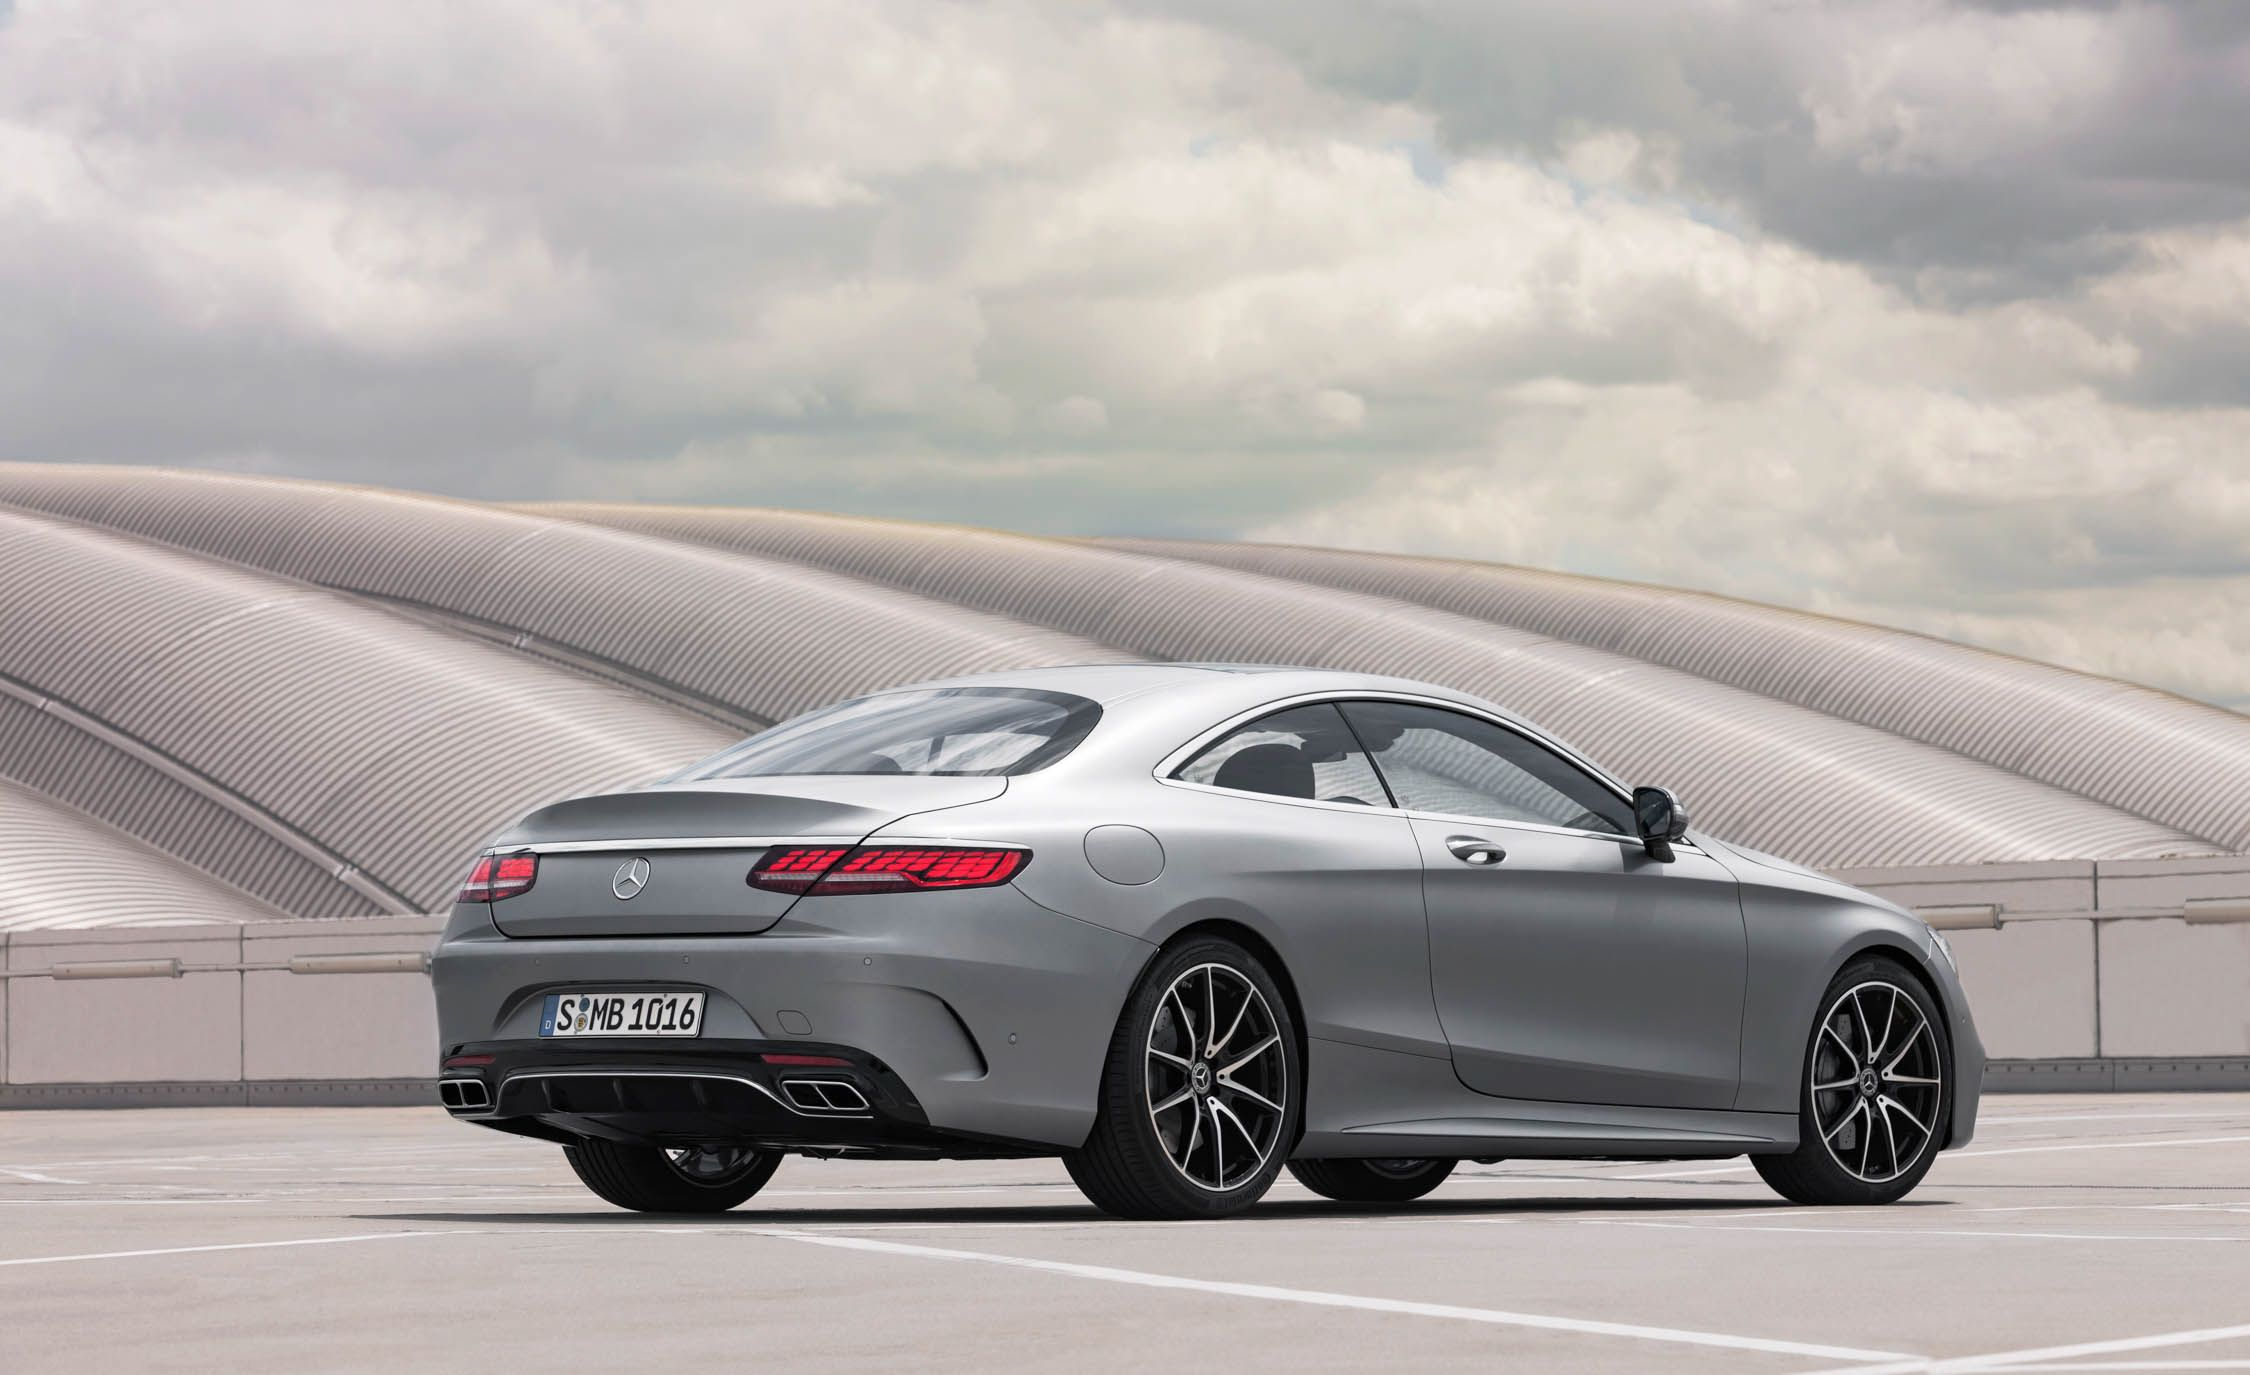 https://hips.hearstapps.com/amv-prod-cad-assets.s3.amazonaws.com/wp-content/uploads/2017/09/Mercedes-Benz-S-Class-187.jpg